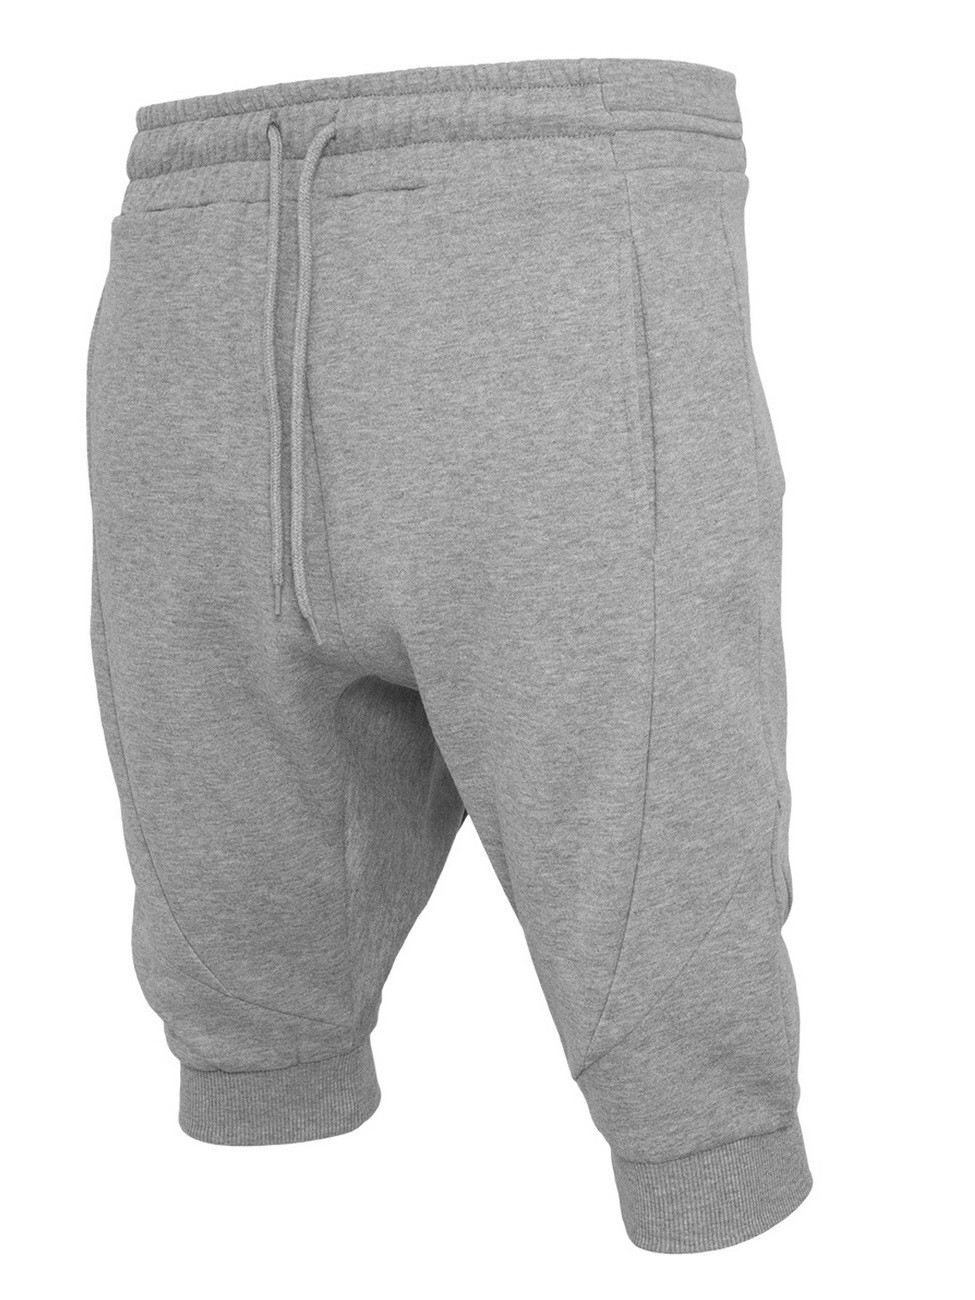 Urban Classics Herren Deep Crotch Undefined Sweatshorts